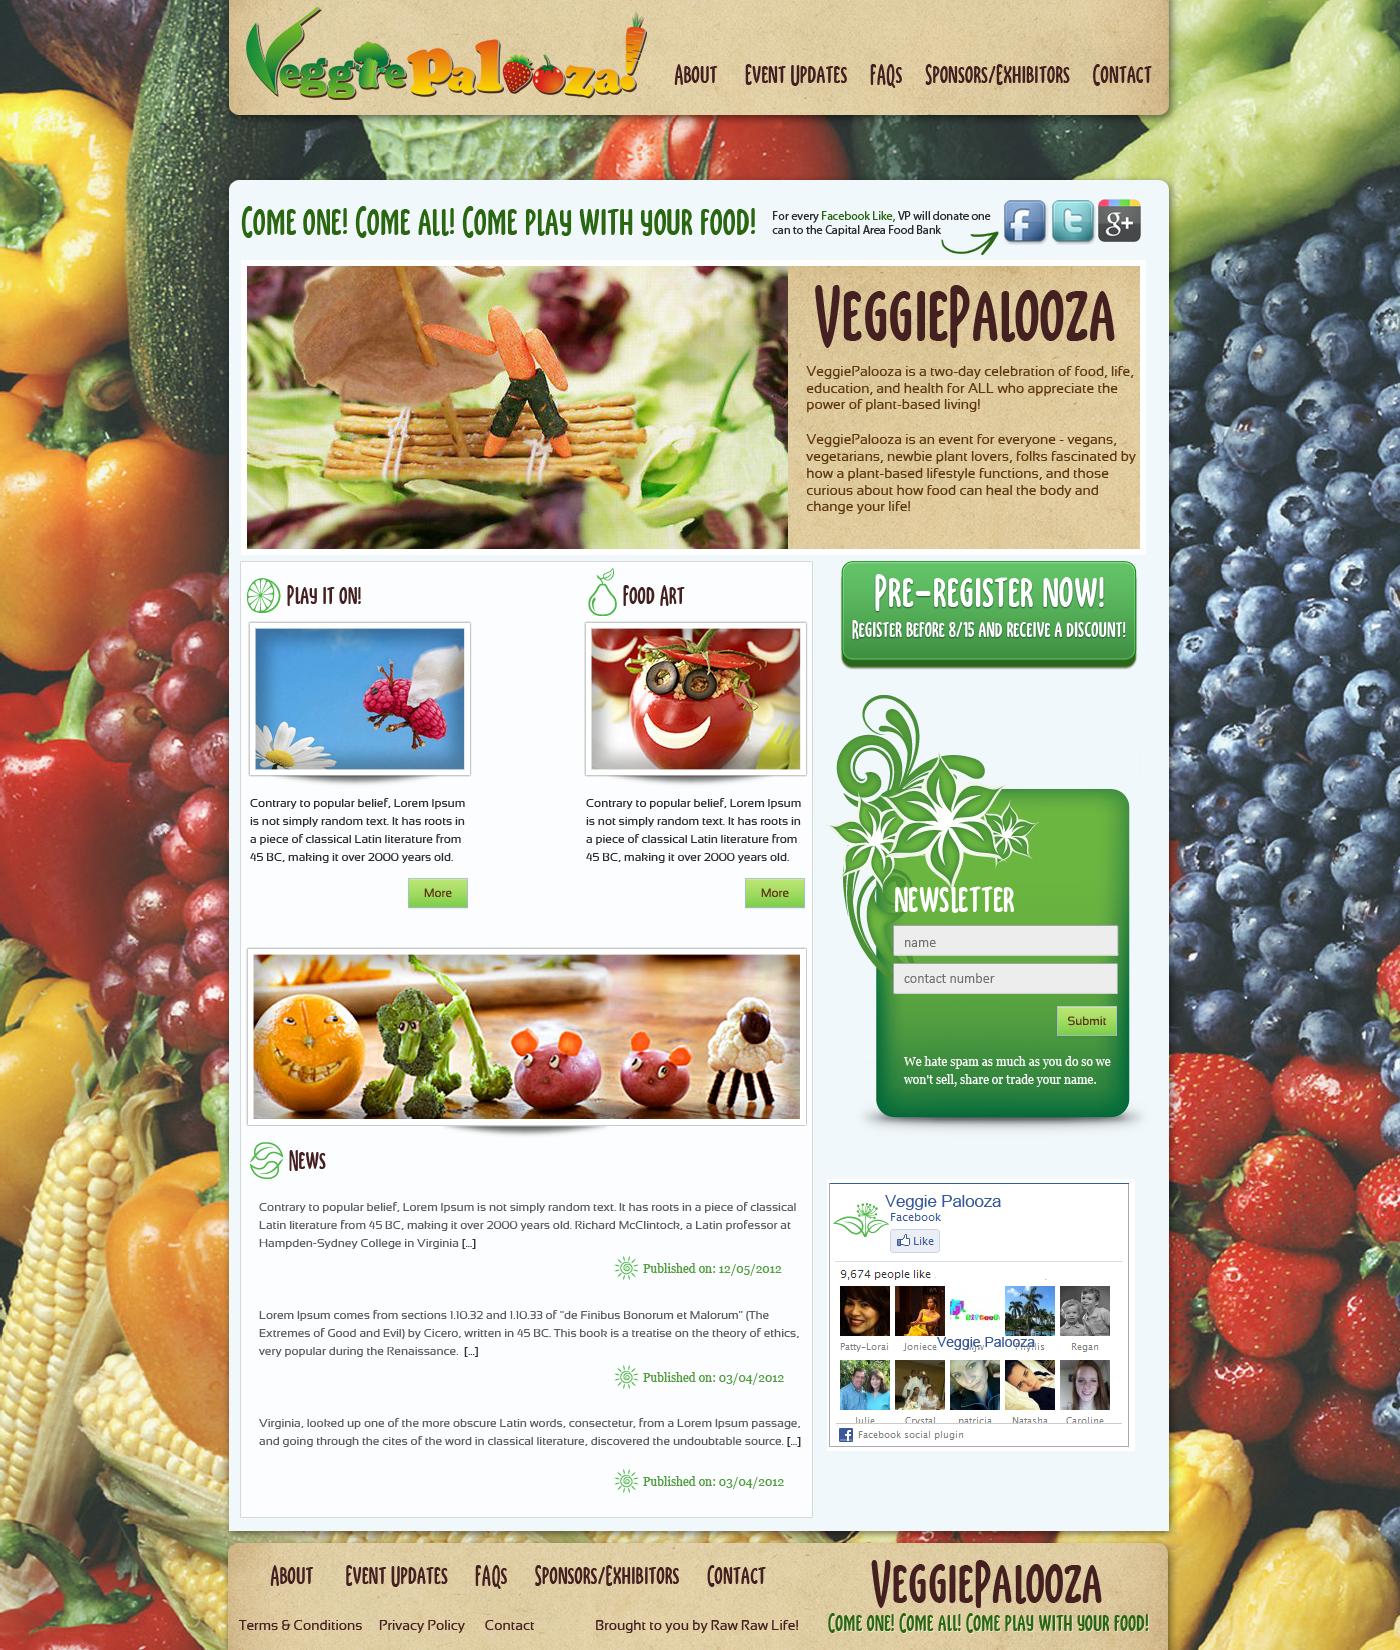 Create the next website design for VeggiePalooza!